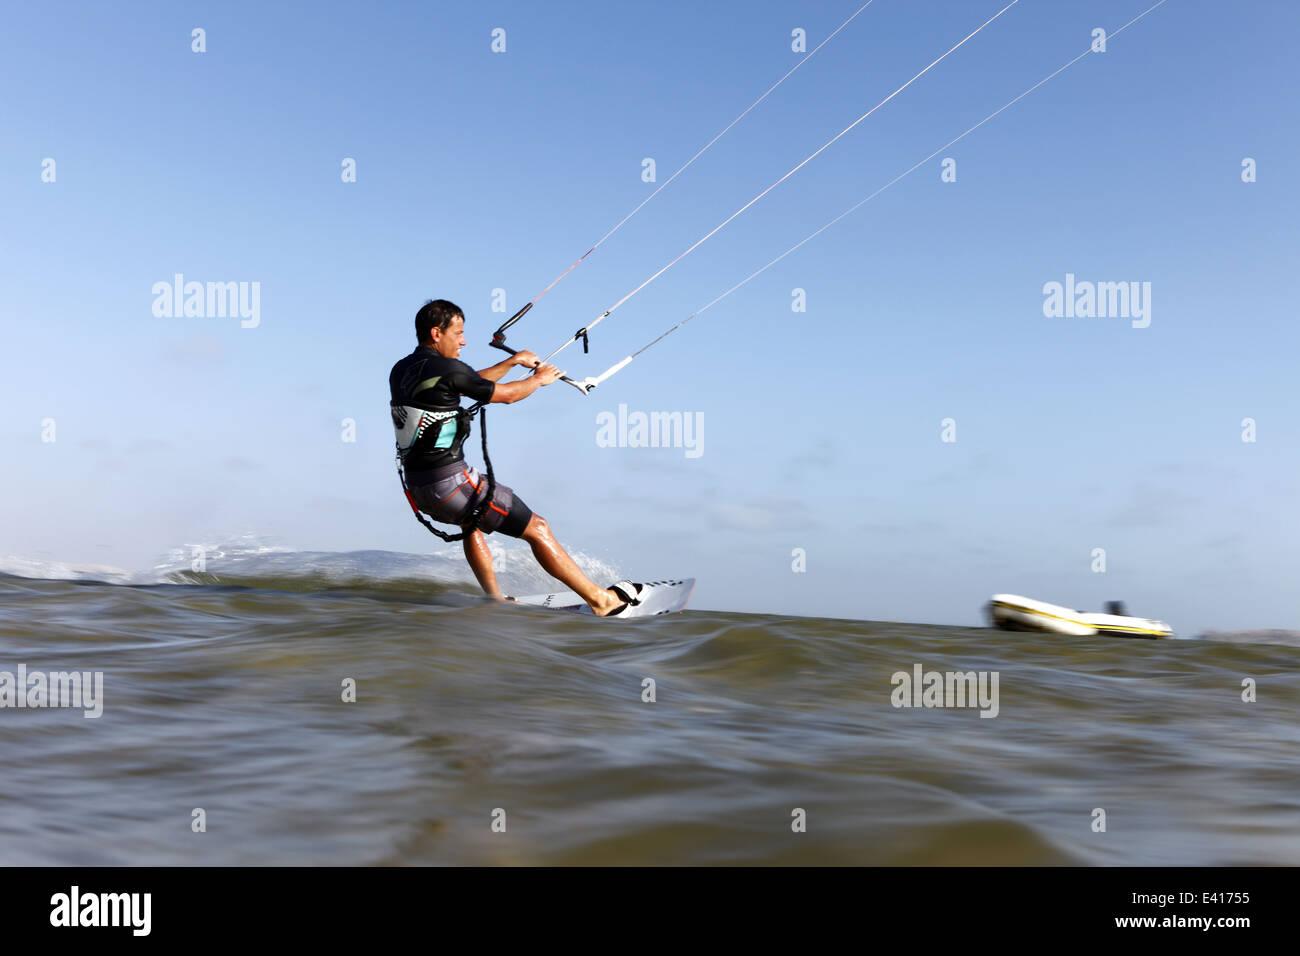 Man kitesurfing at speed on the horizon of the lagoon in Dakhla, Western Sahara, Morocco - Stock Image